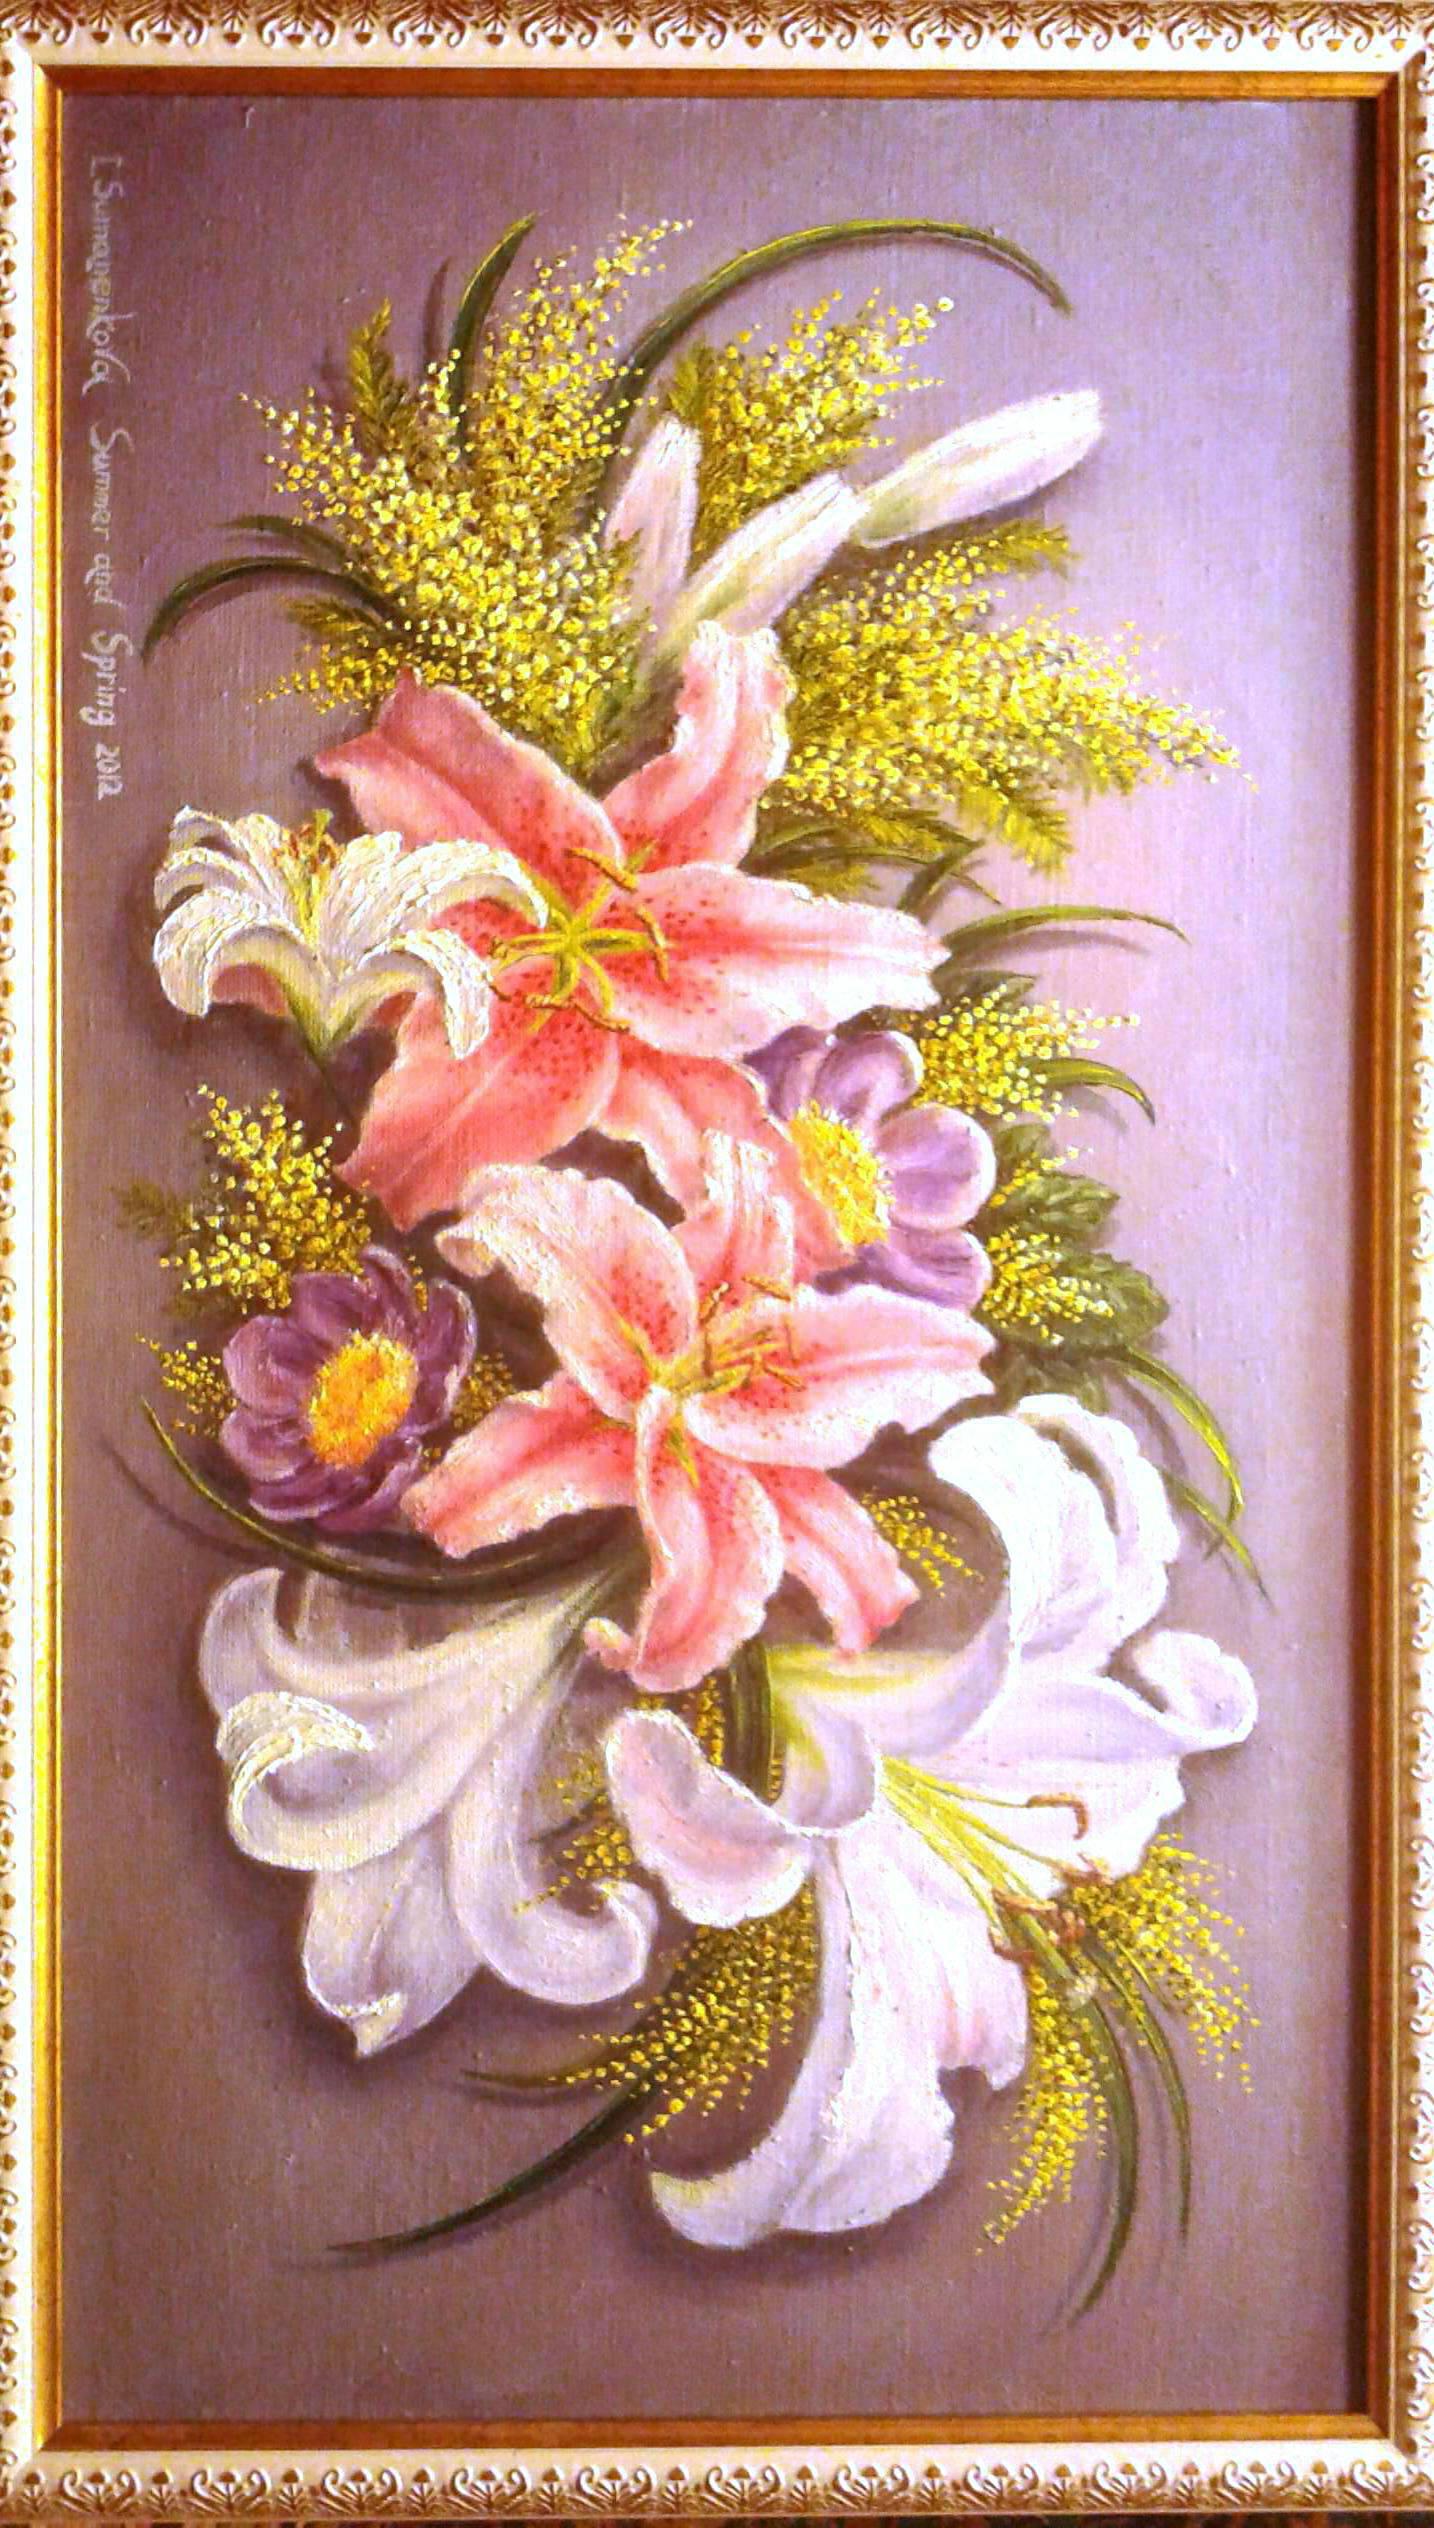 Лето и Весна / Summer and Spring 40 x 70 cм, холст, масло, 2012 г